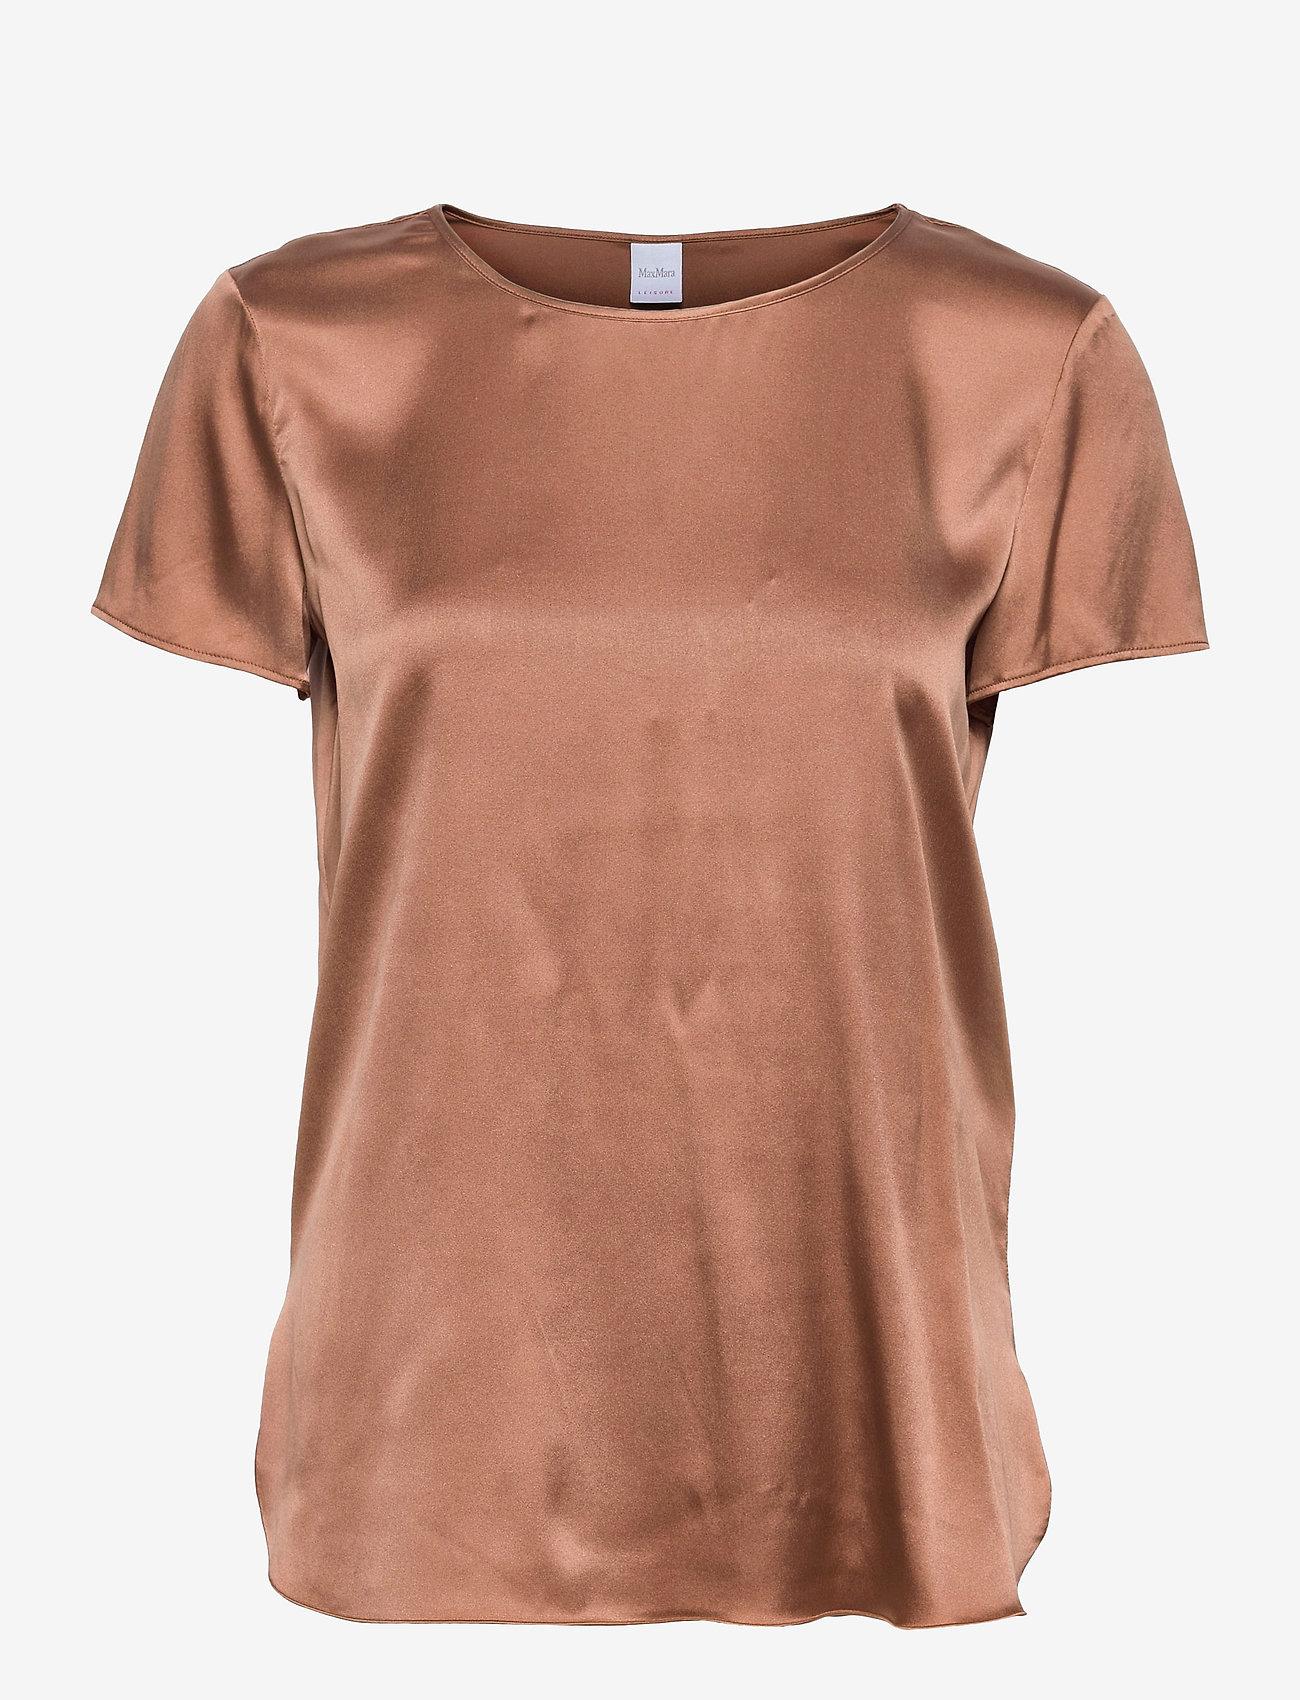 Max Mara Leisure - CORTONA - short-sleeved blouses - tobacco - 0